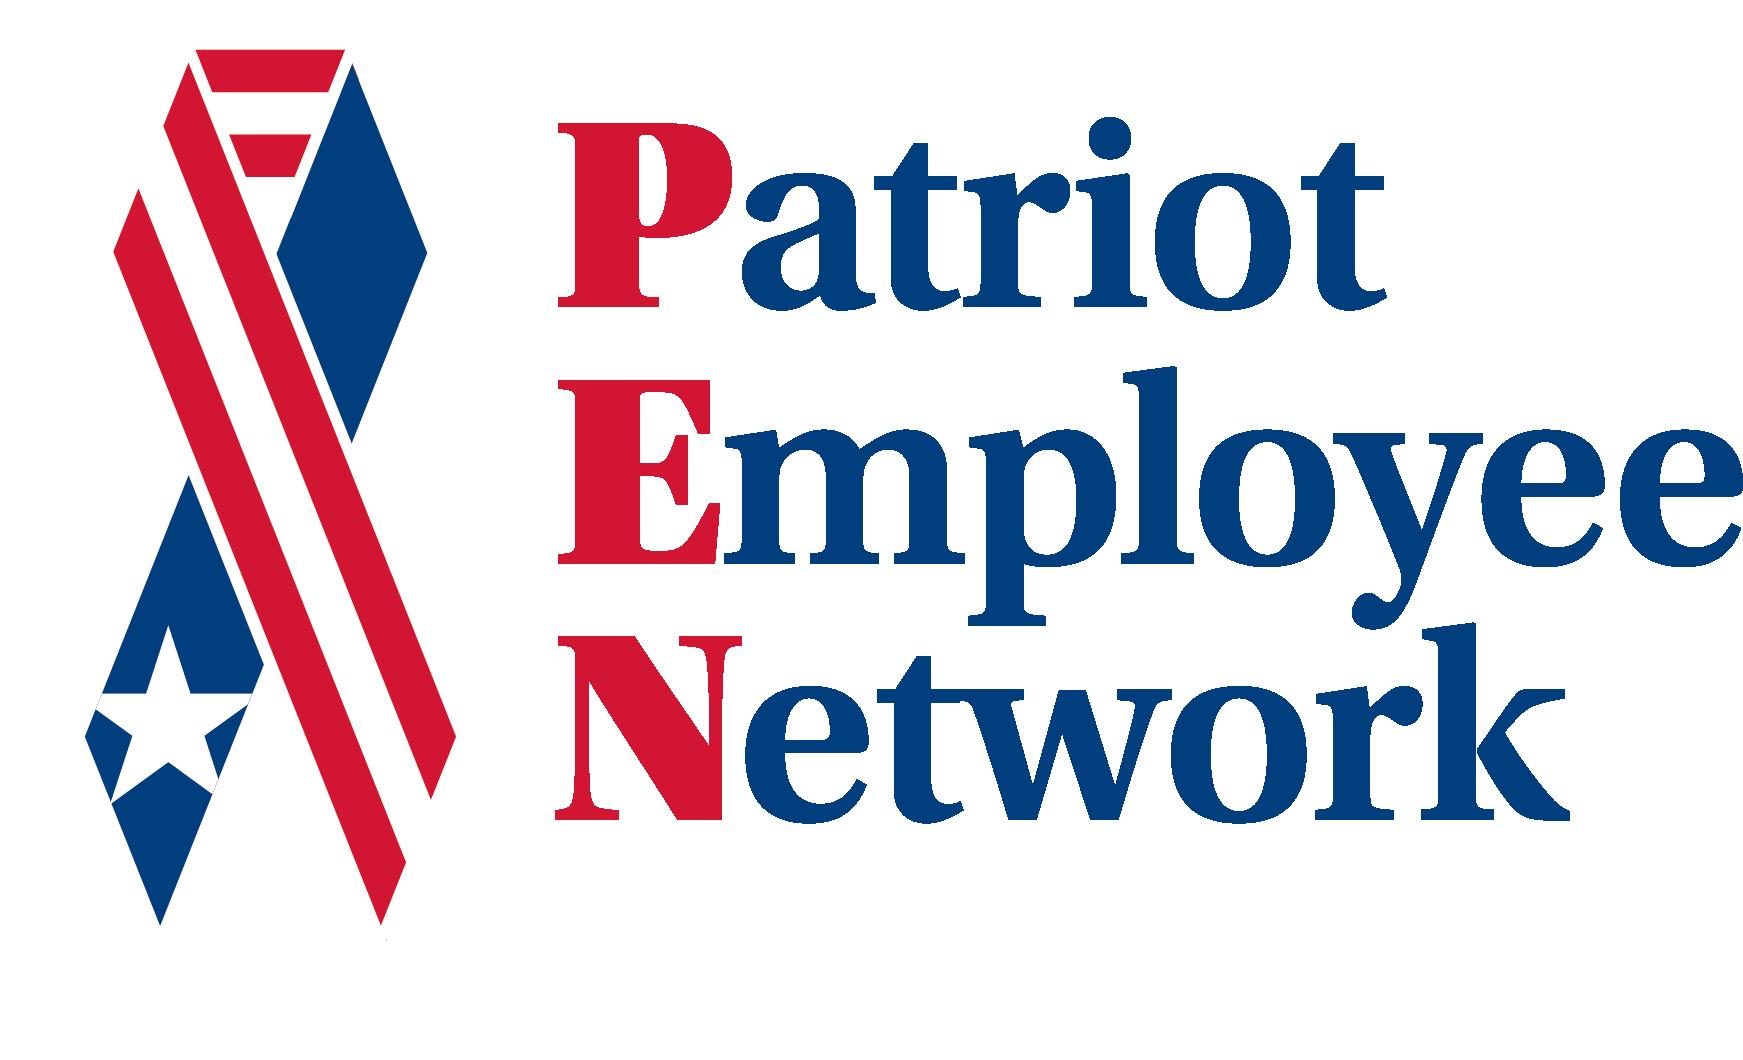 Patriot Employee Network